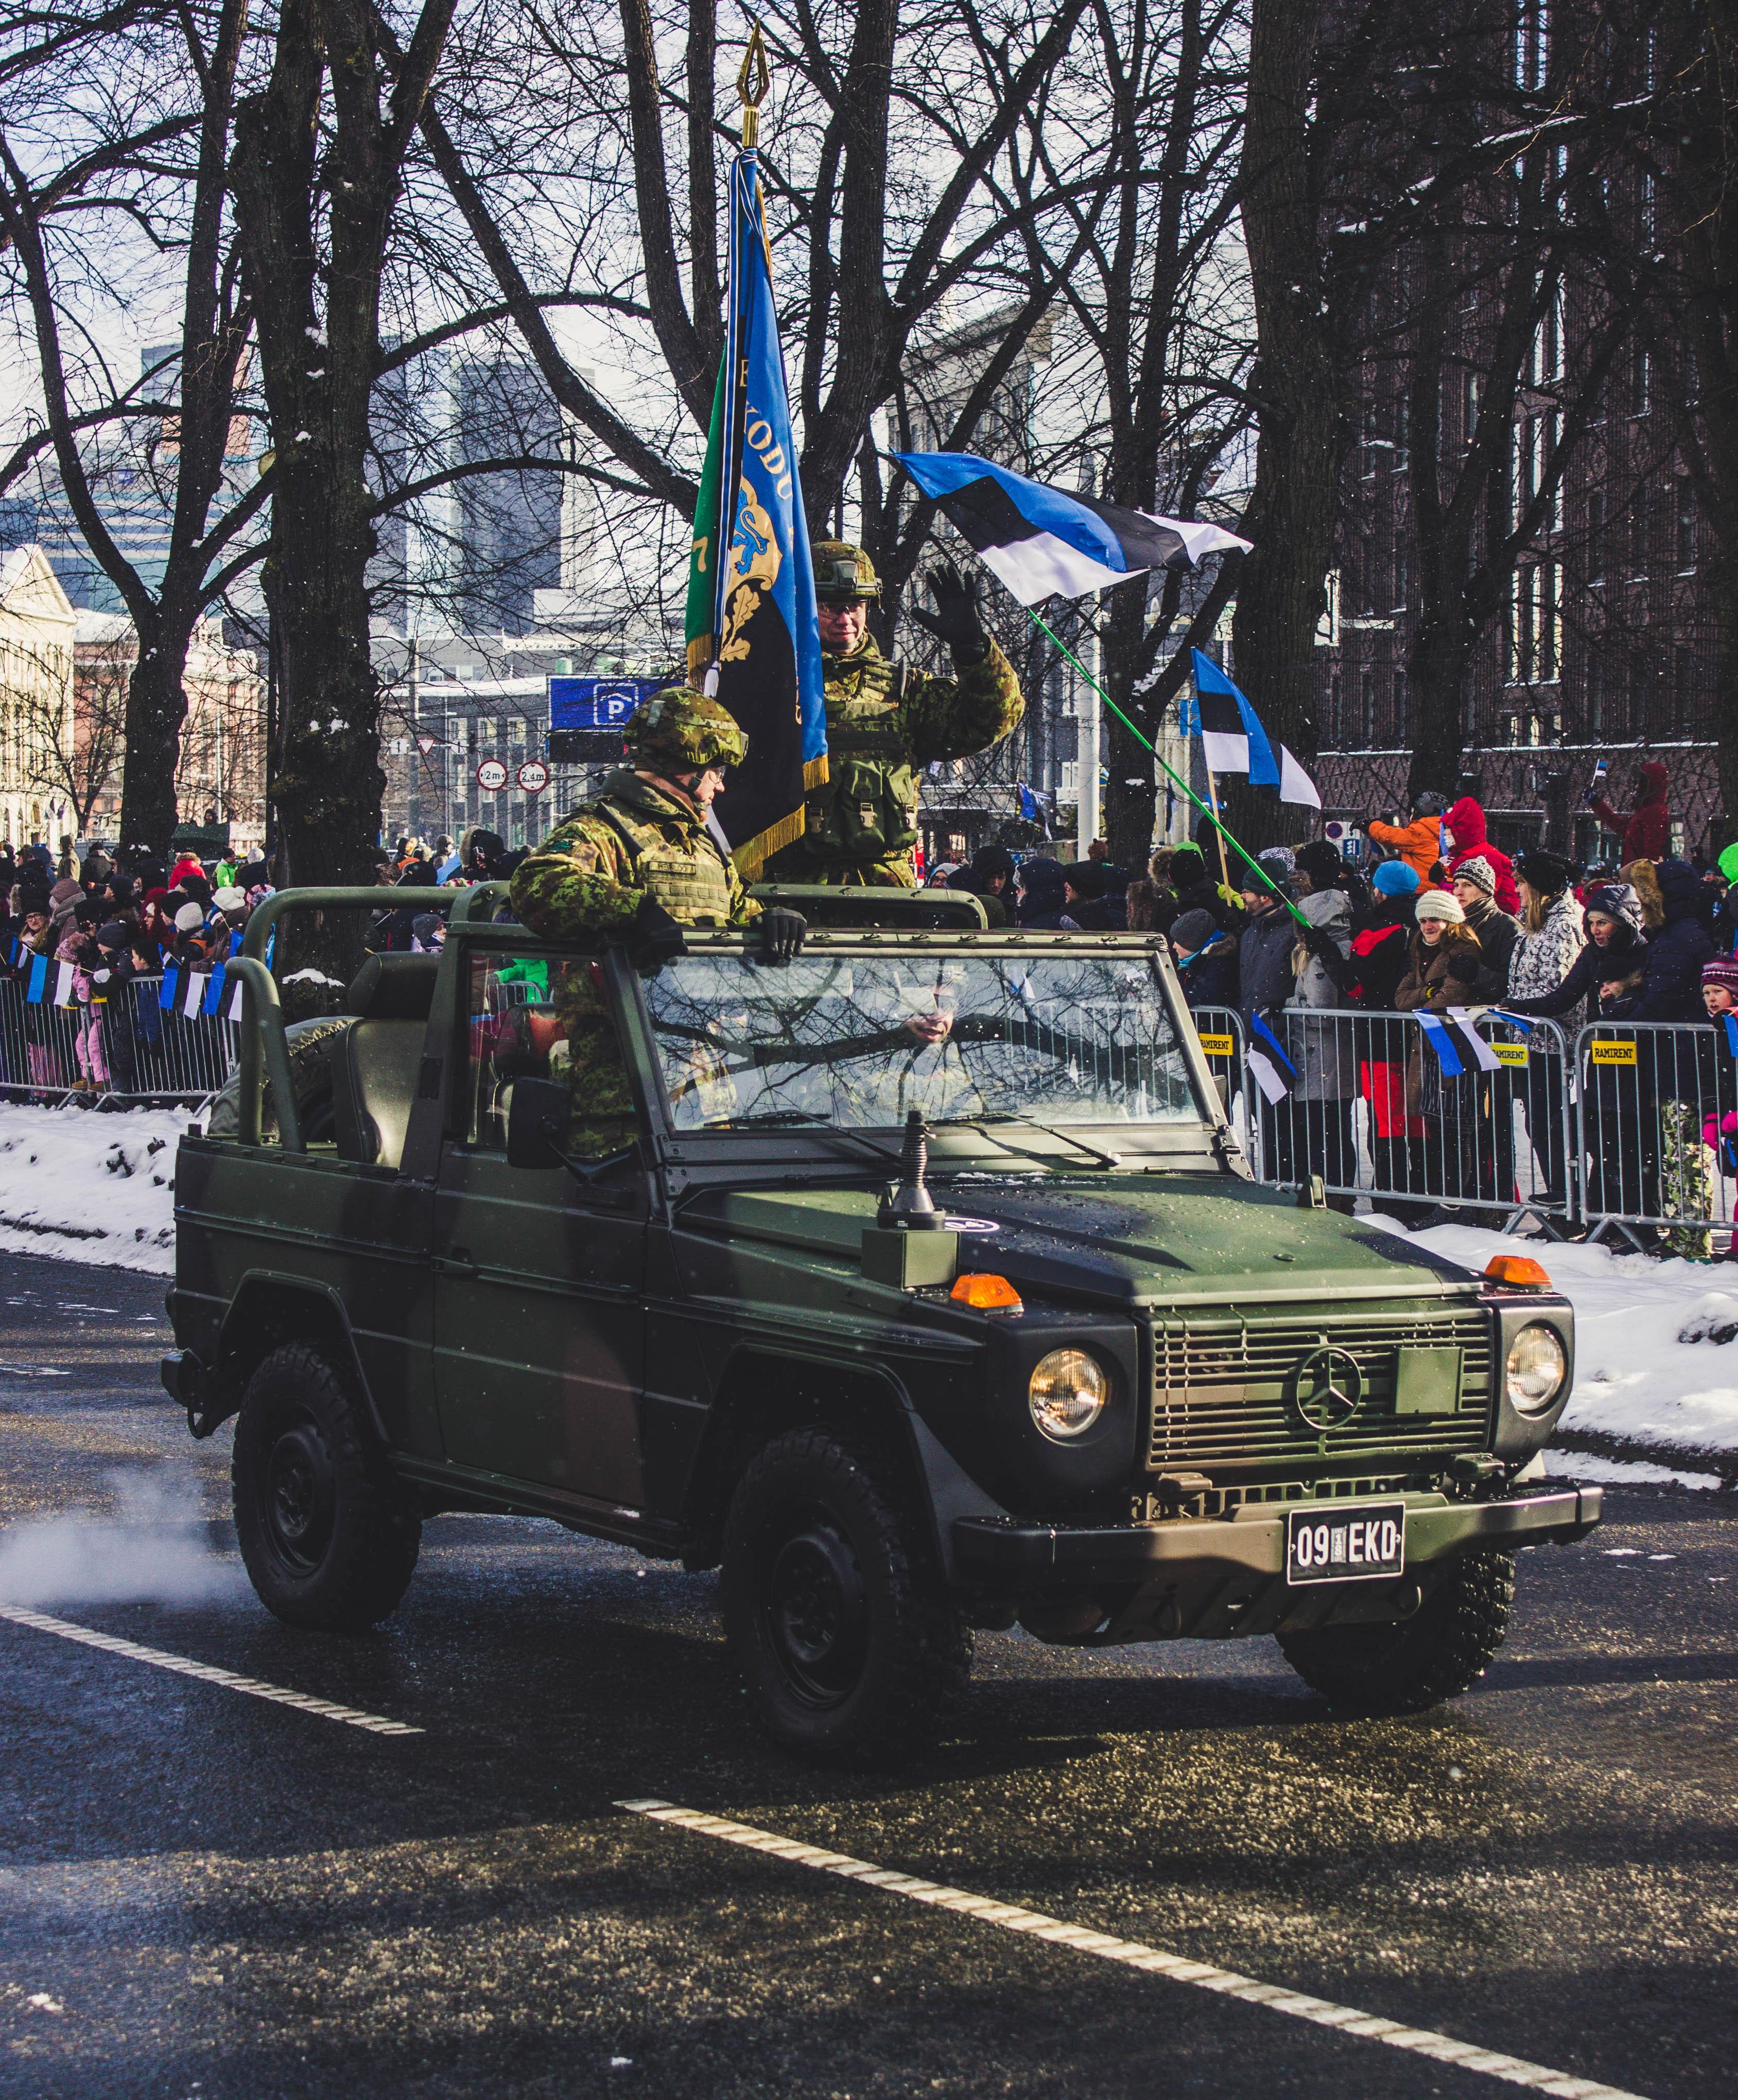 Blue Mercedes-benz Wrangler, Army, Parade, Vehicle, Uniform, HQ Photo